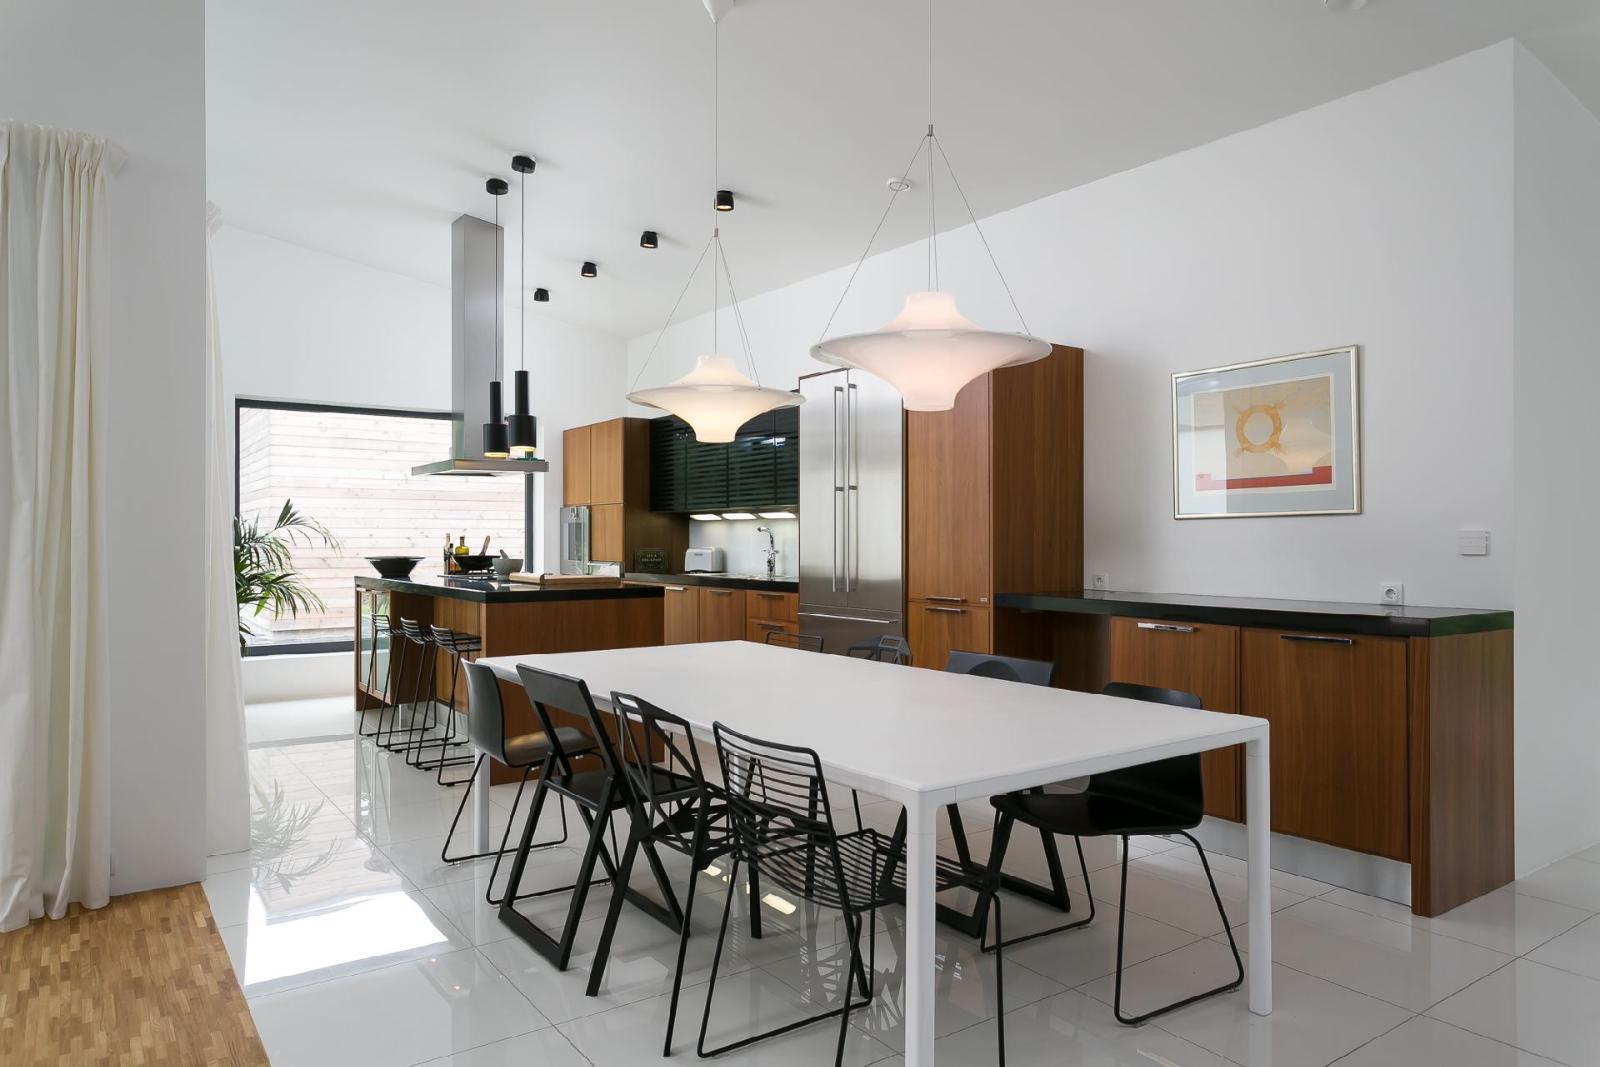 Moderni keittiö 1168068  Etuovi com Ideat & vinkit